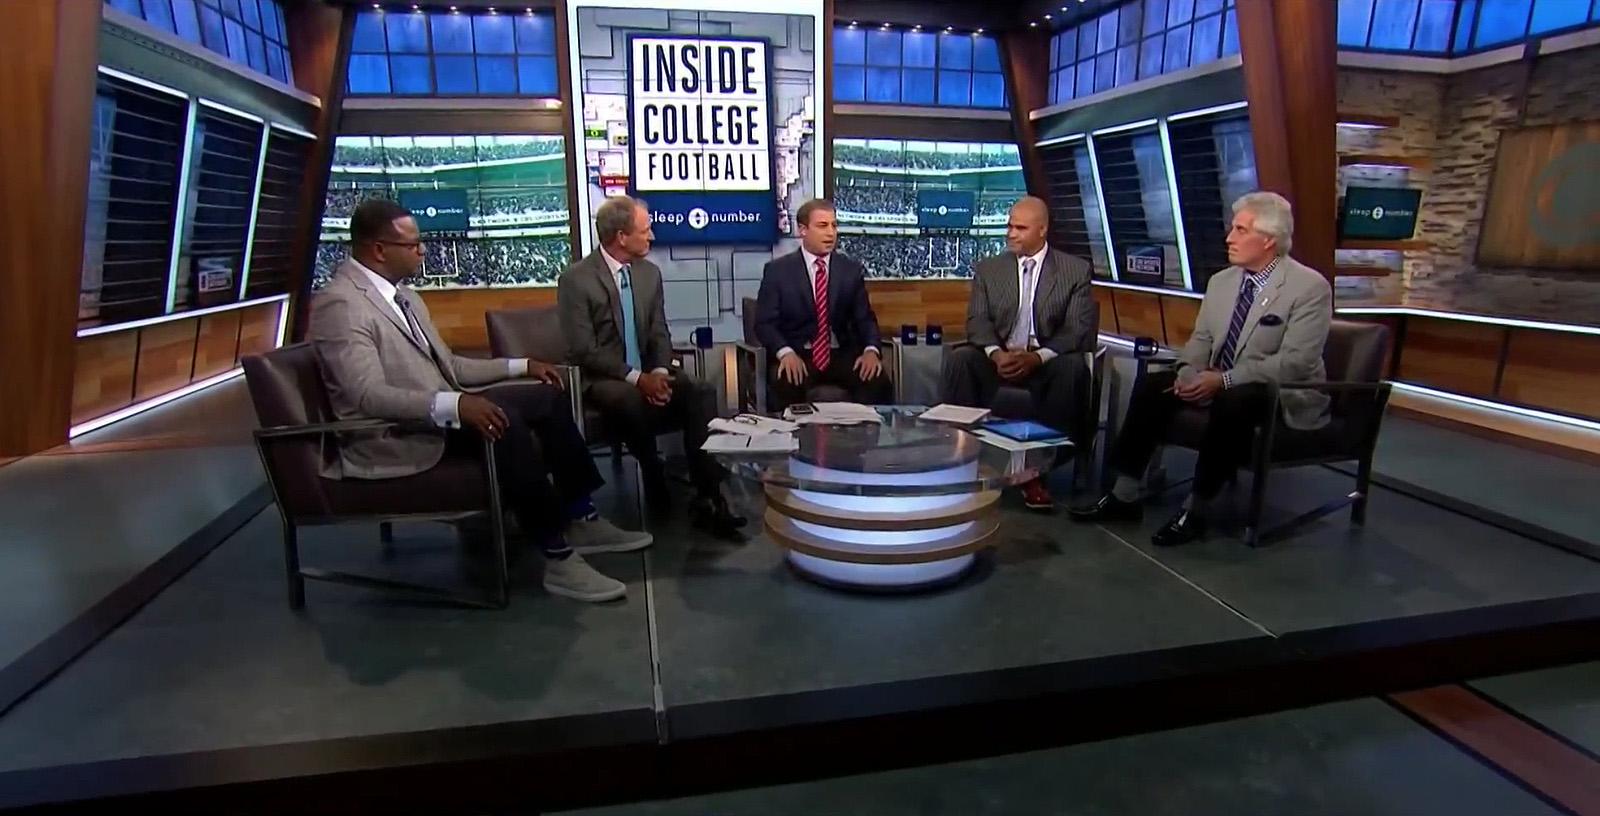 NCS_CBS-Sports-Network-Studio-2018_0008